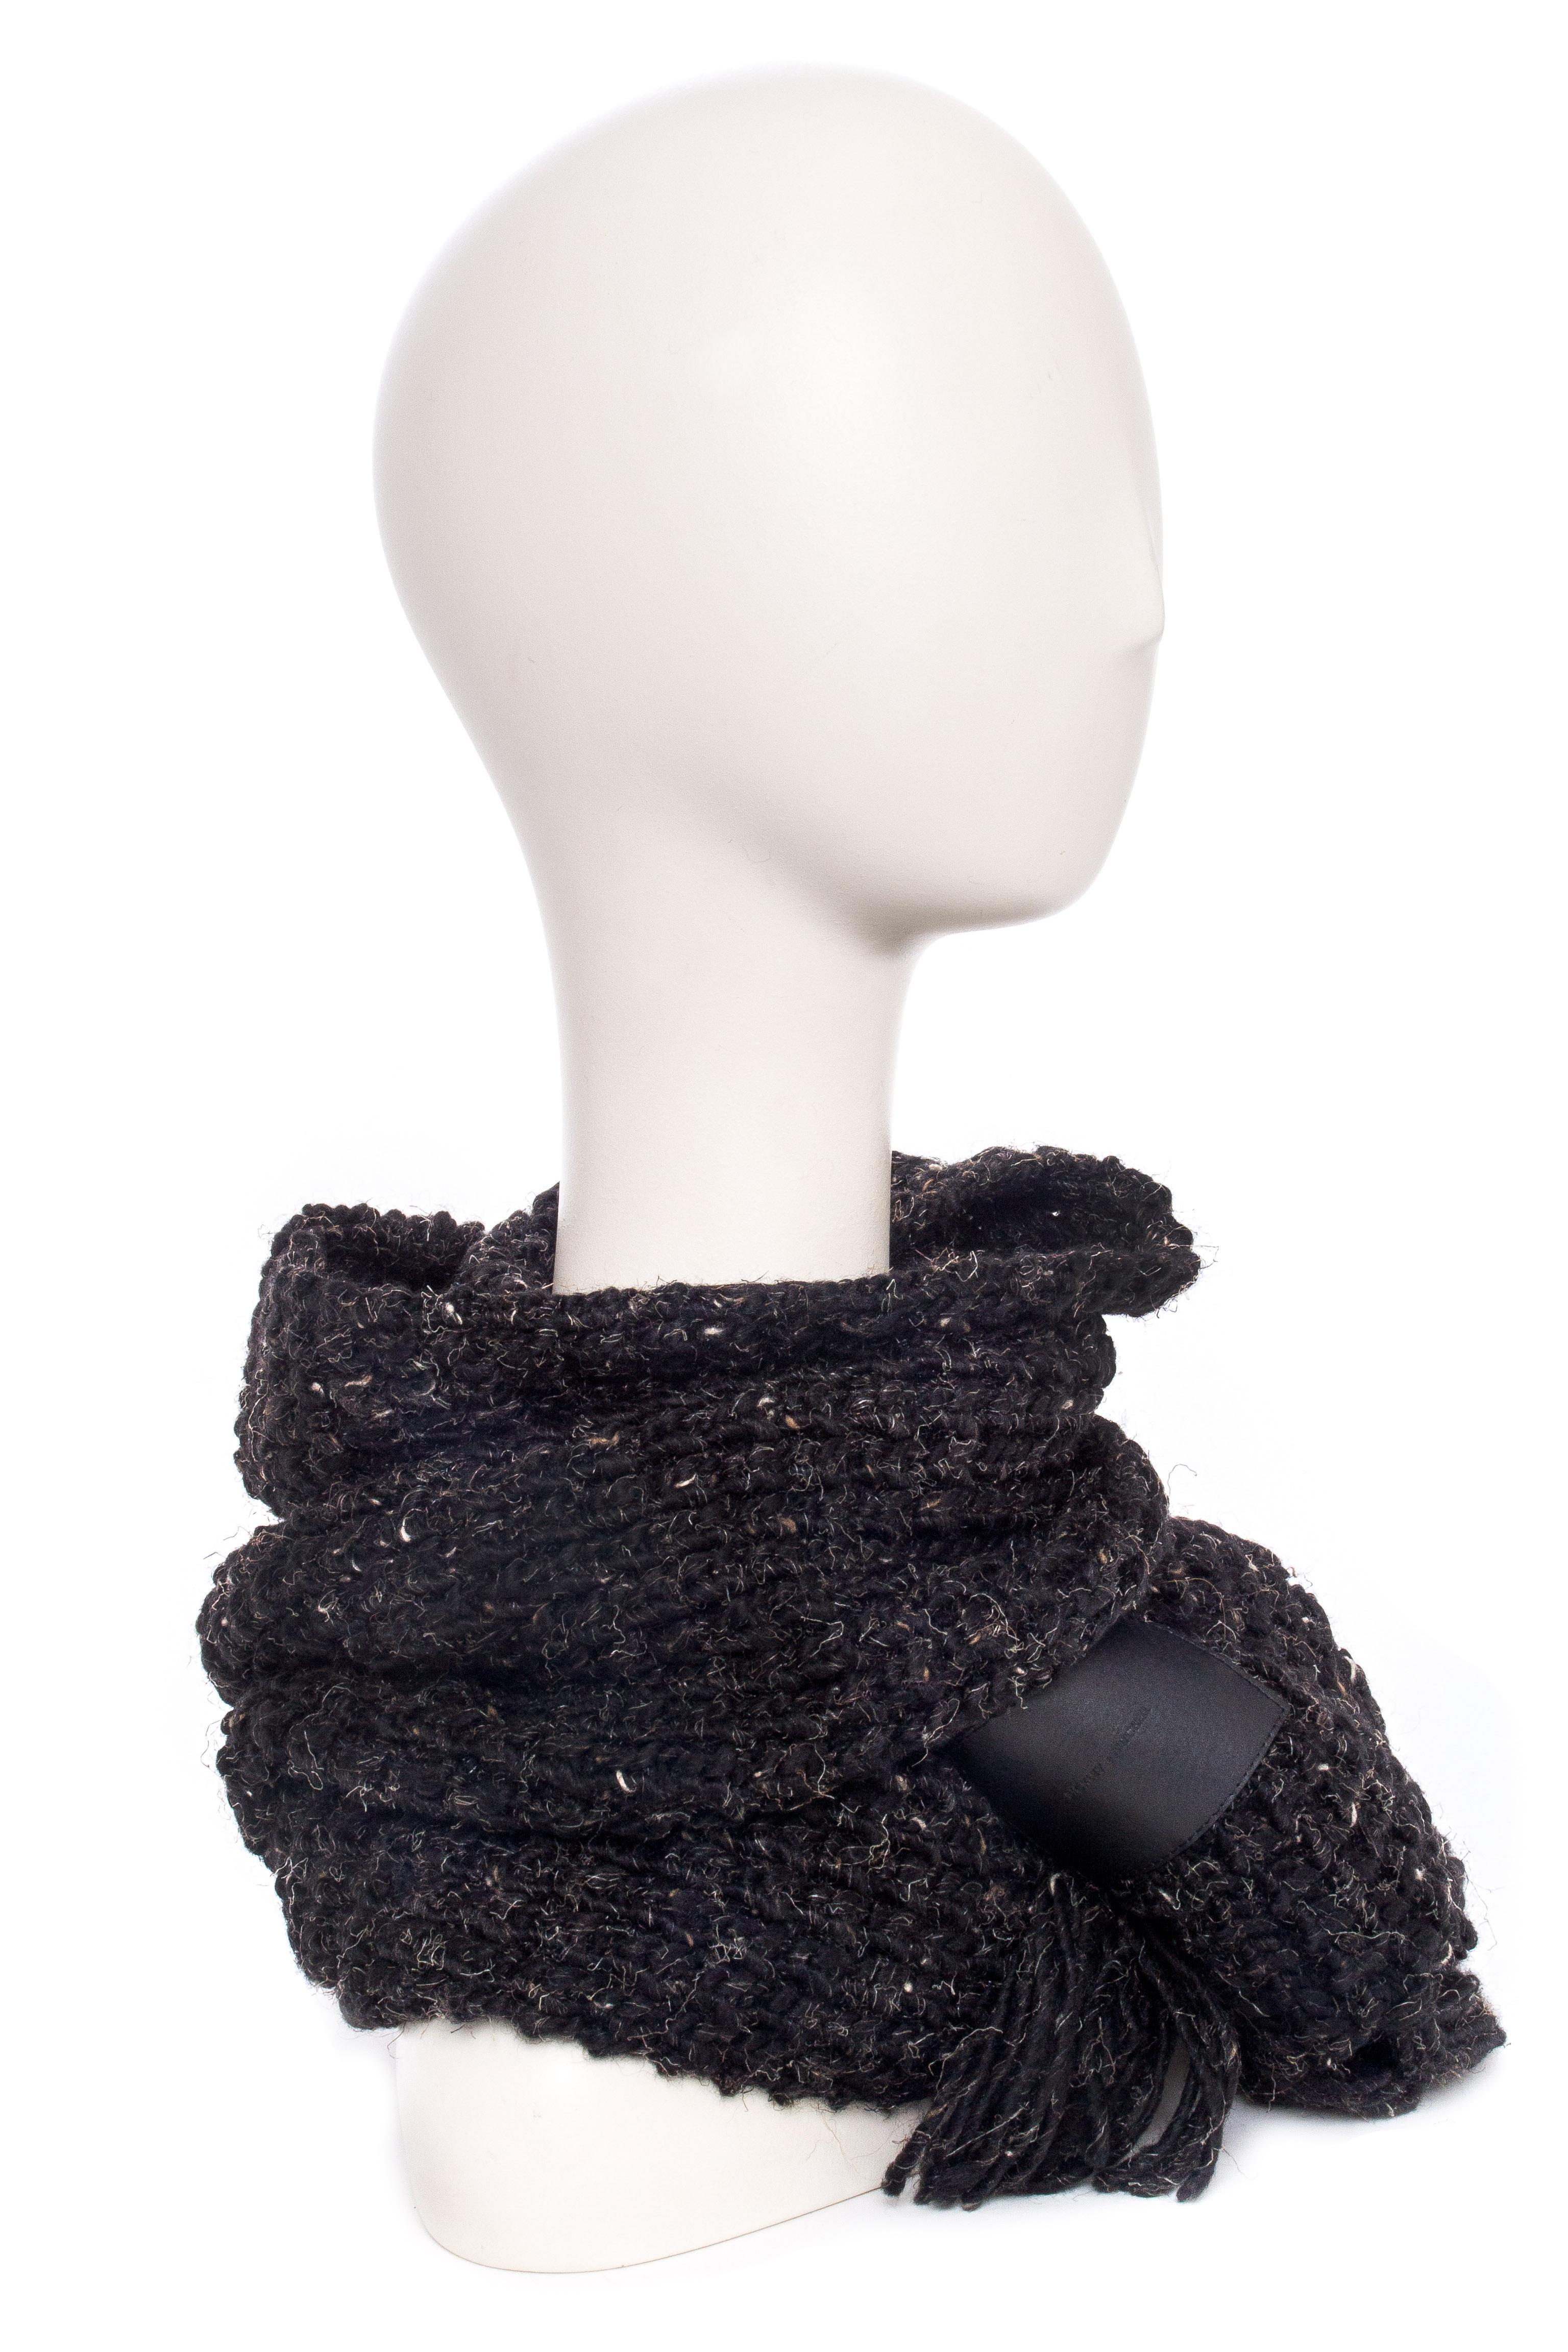 BICKLEY + MITCHELL Warm Multi-Toned Knit Scarf - Black